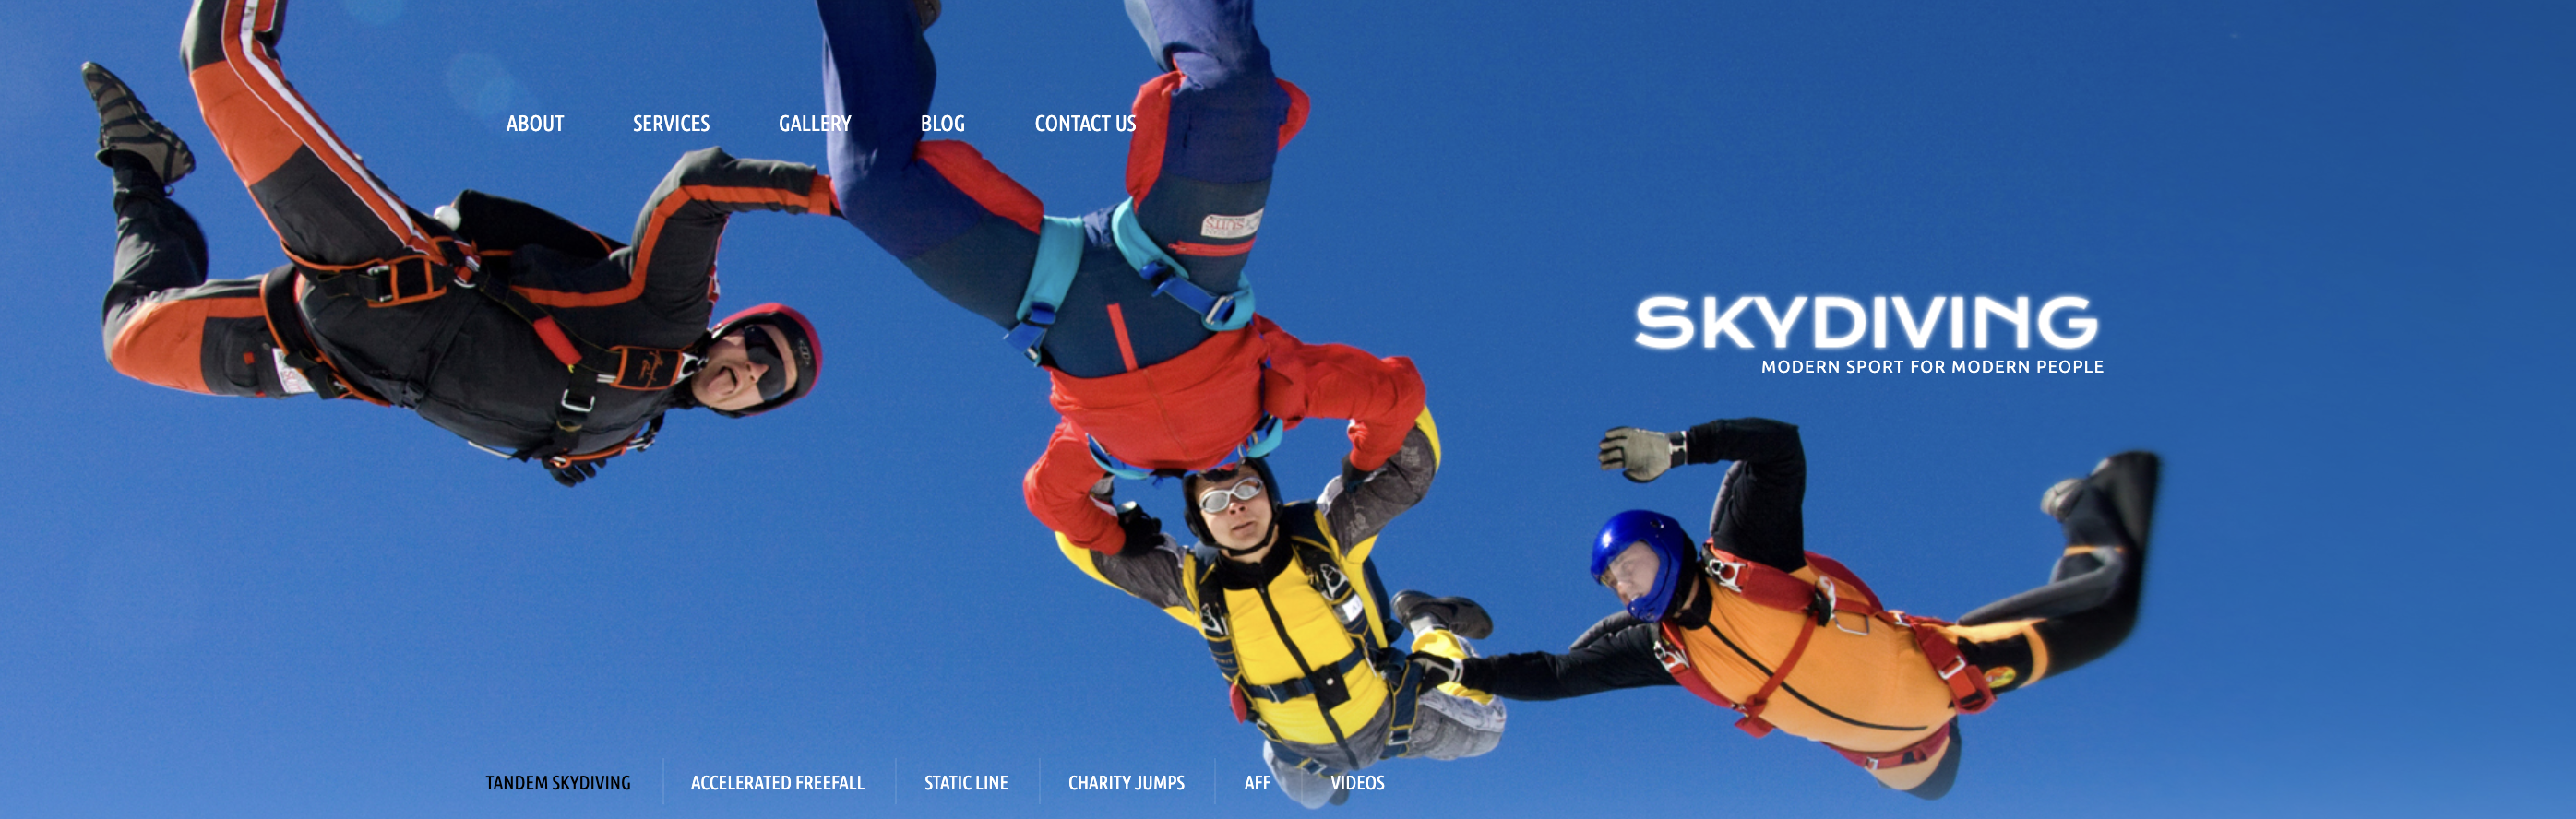 Skydiving blue wordpress theme